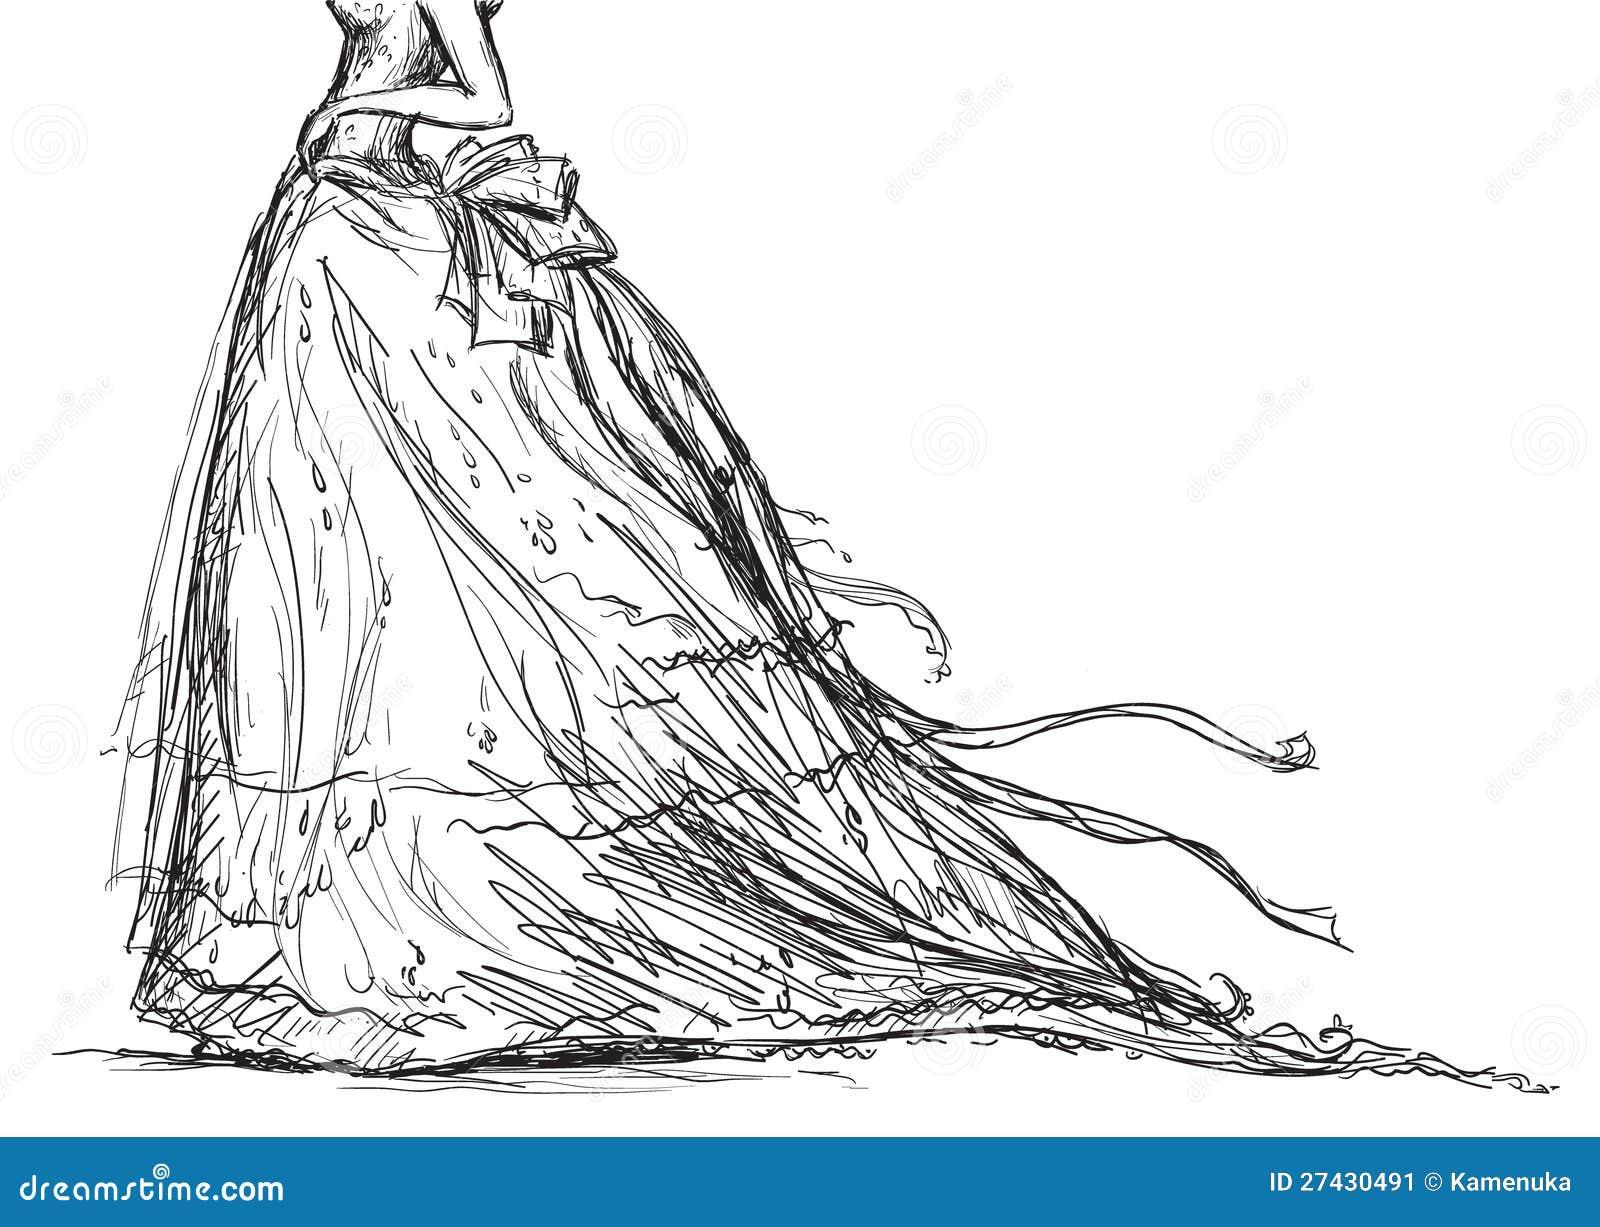 Bridal Dress Drawing Stock Vector. Illustration Of Retro